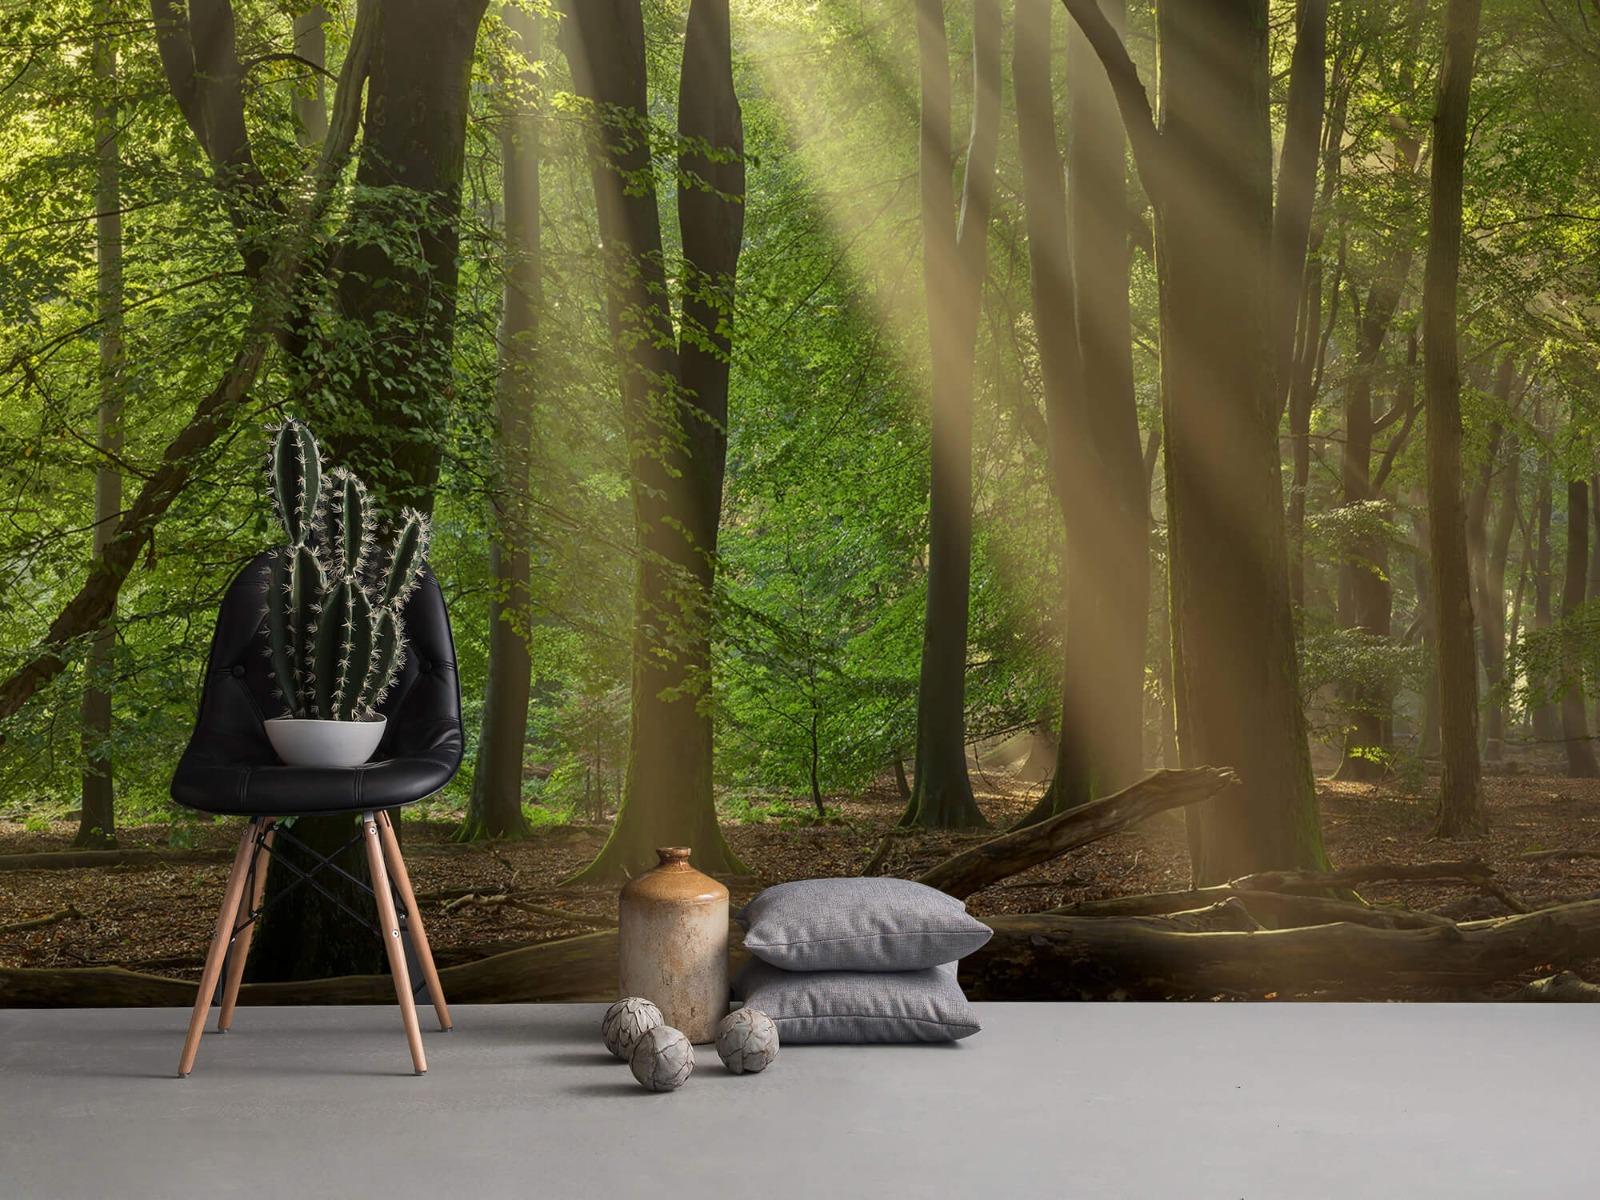 Bomen - Zonneharpen in het bos - Slaapkamer 14